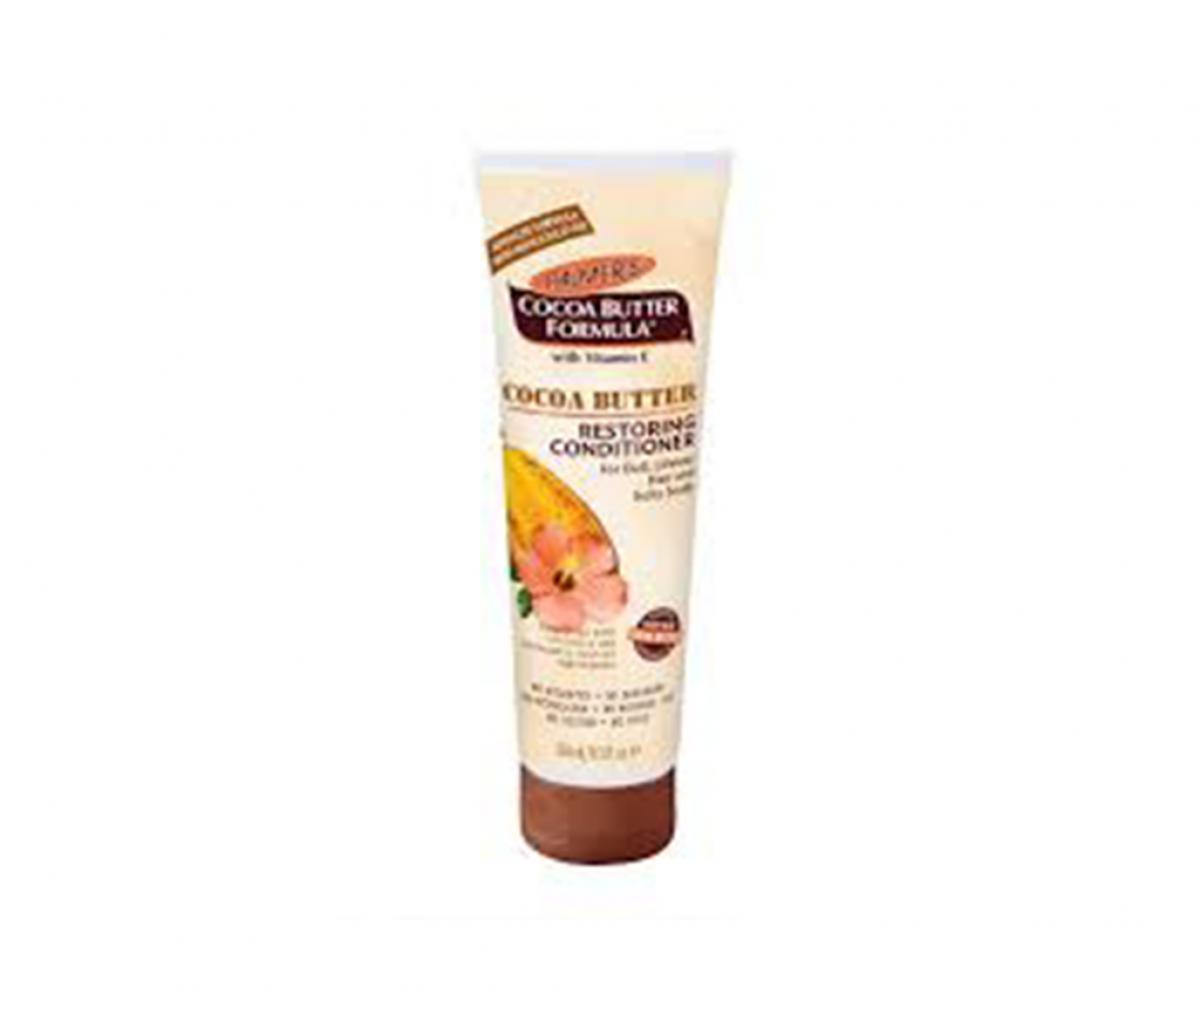 Palmers cocoa butter formula Restoring conditioner